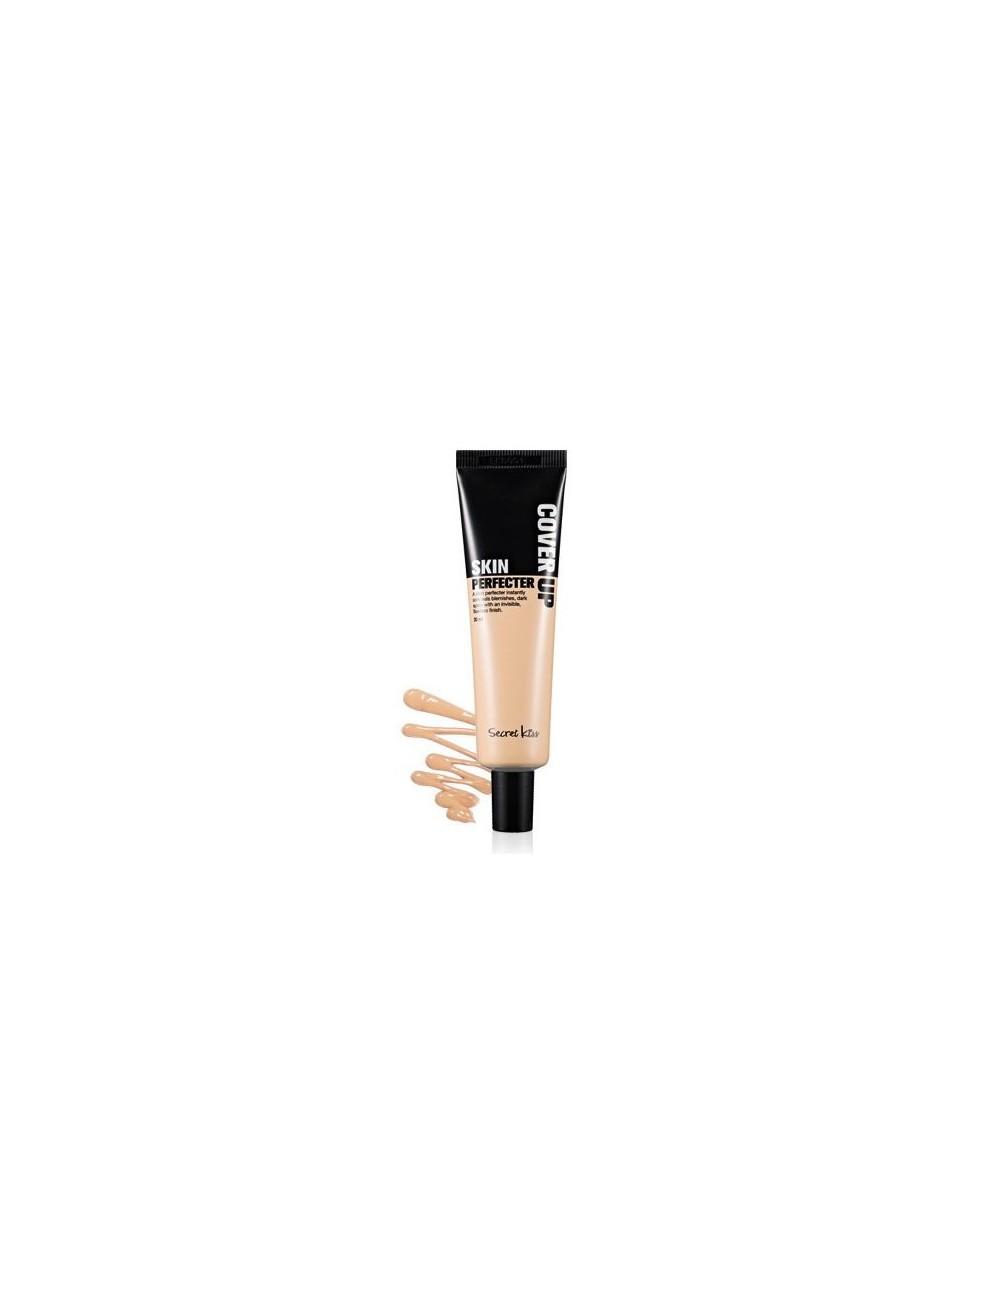 BB Cream Secret Key Cover Up Skin Perfecter N.23 (Natural Beige)